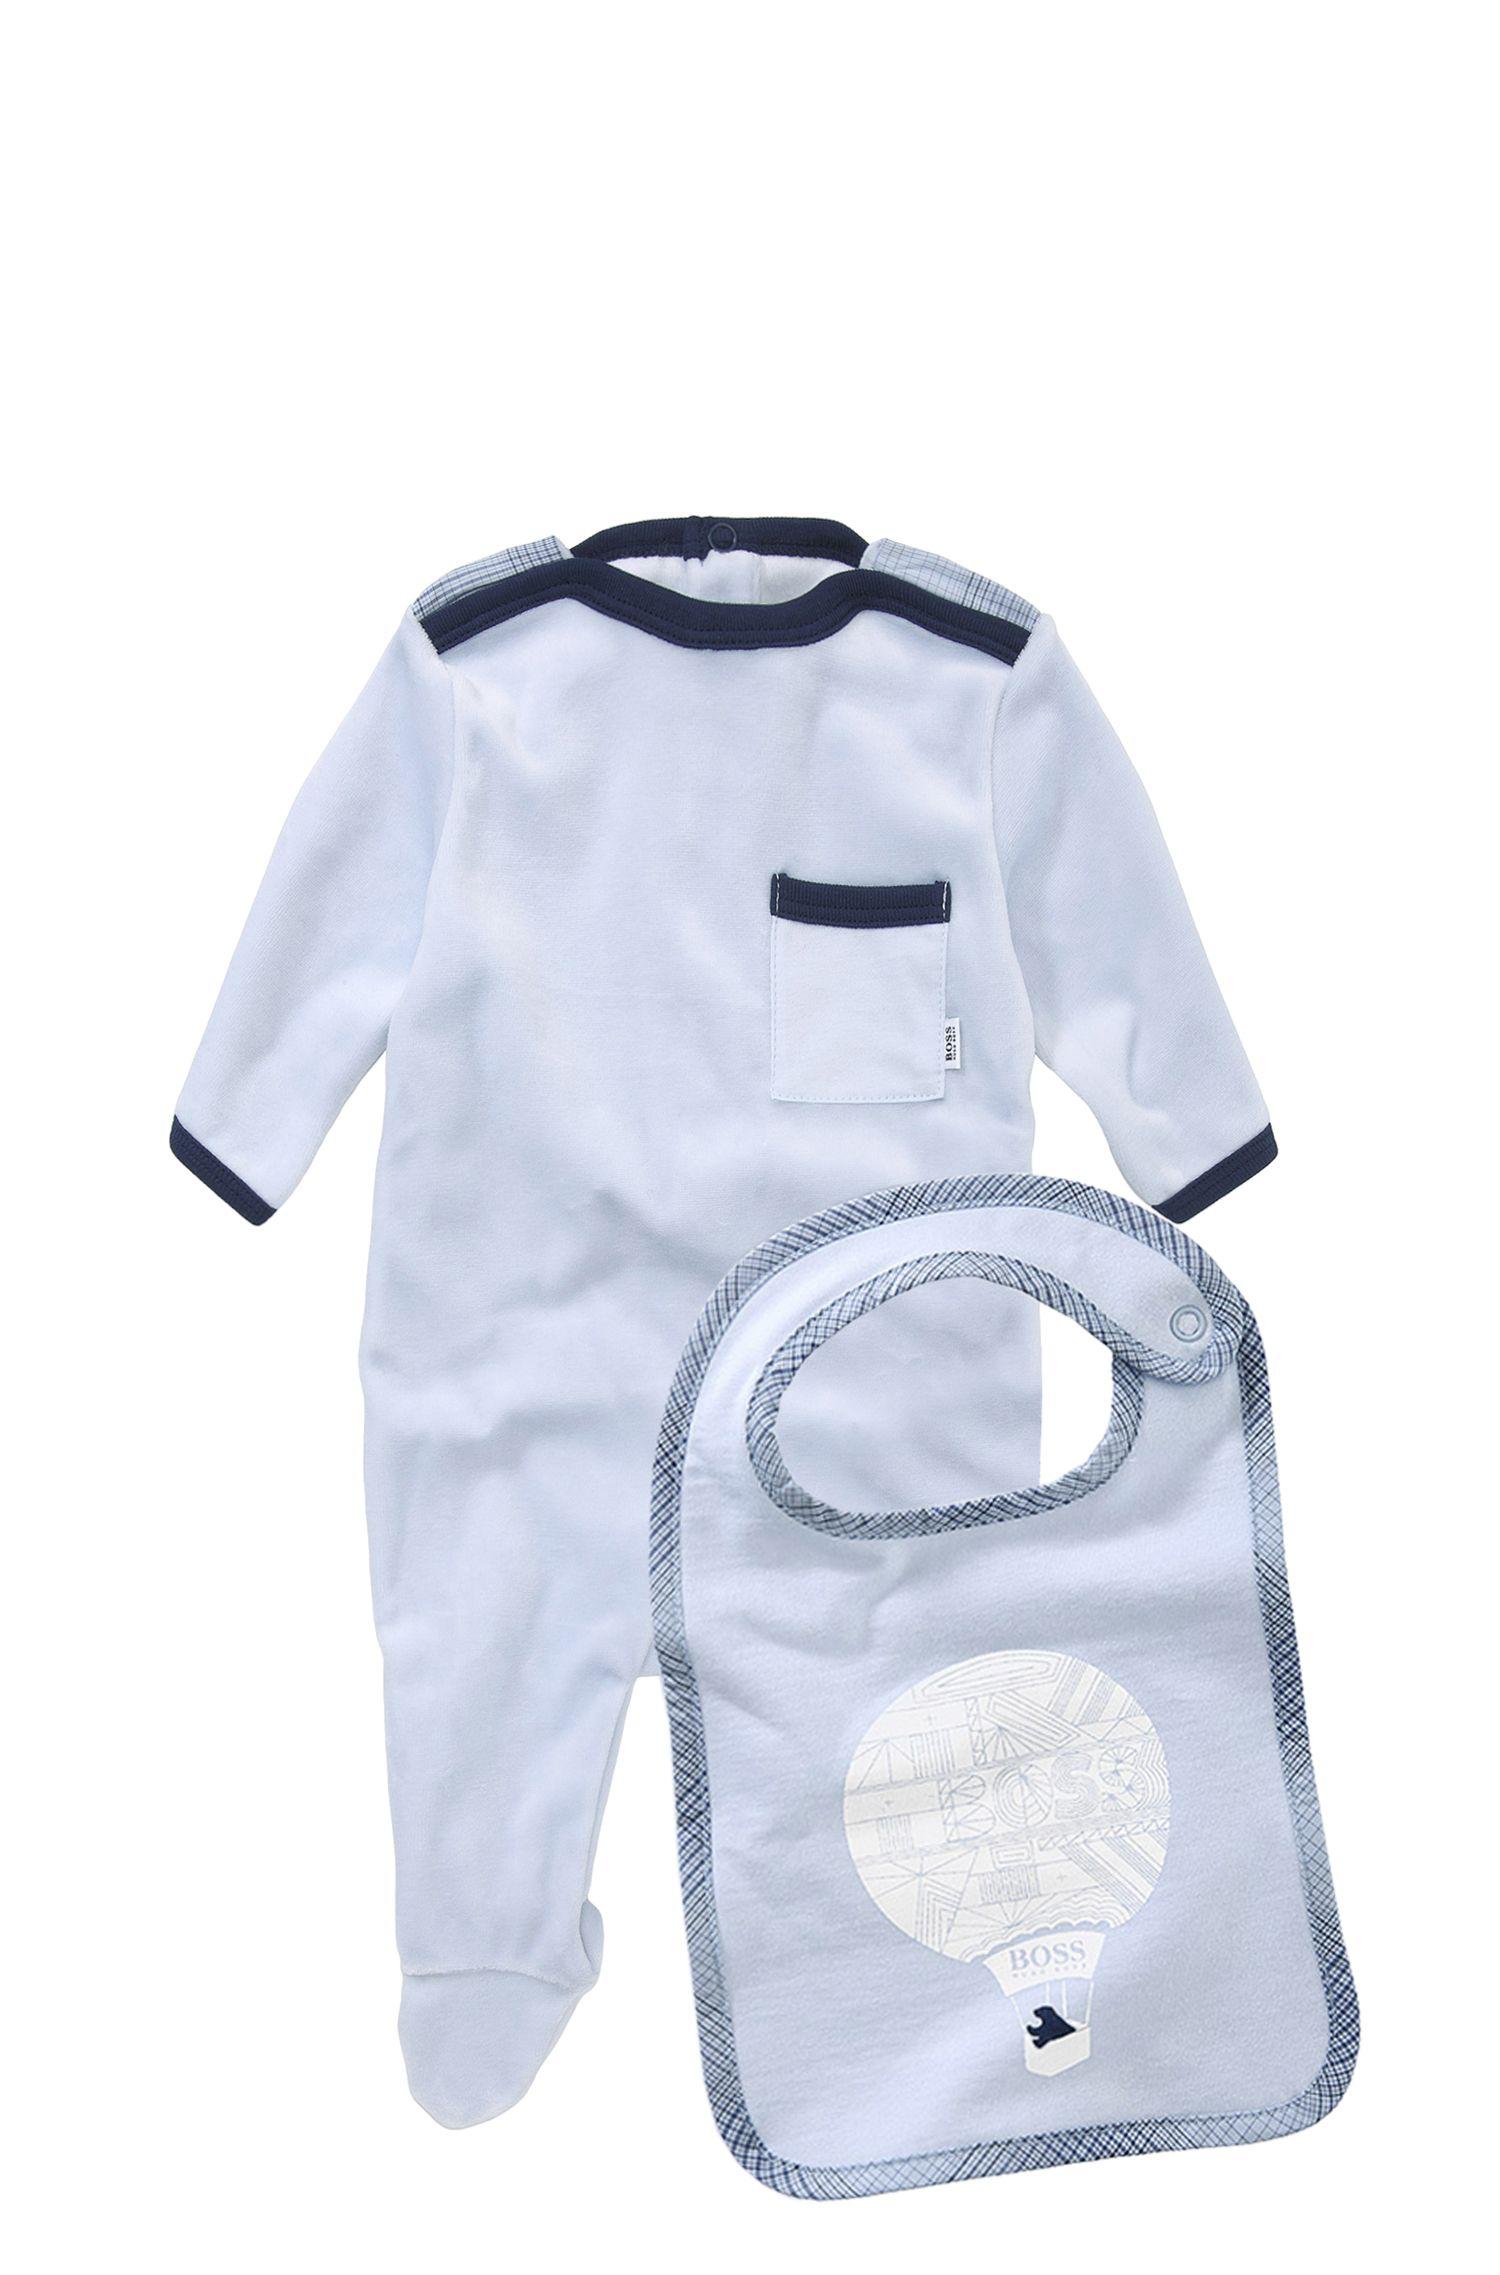 'J98086' | Infant Cotton Blend Onesie and Bib Set